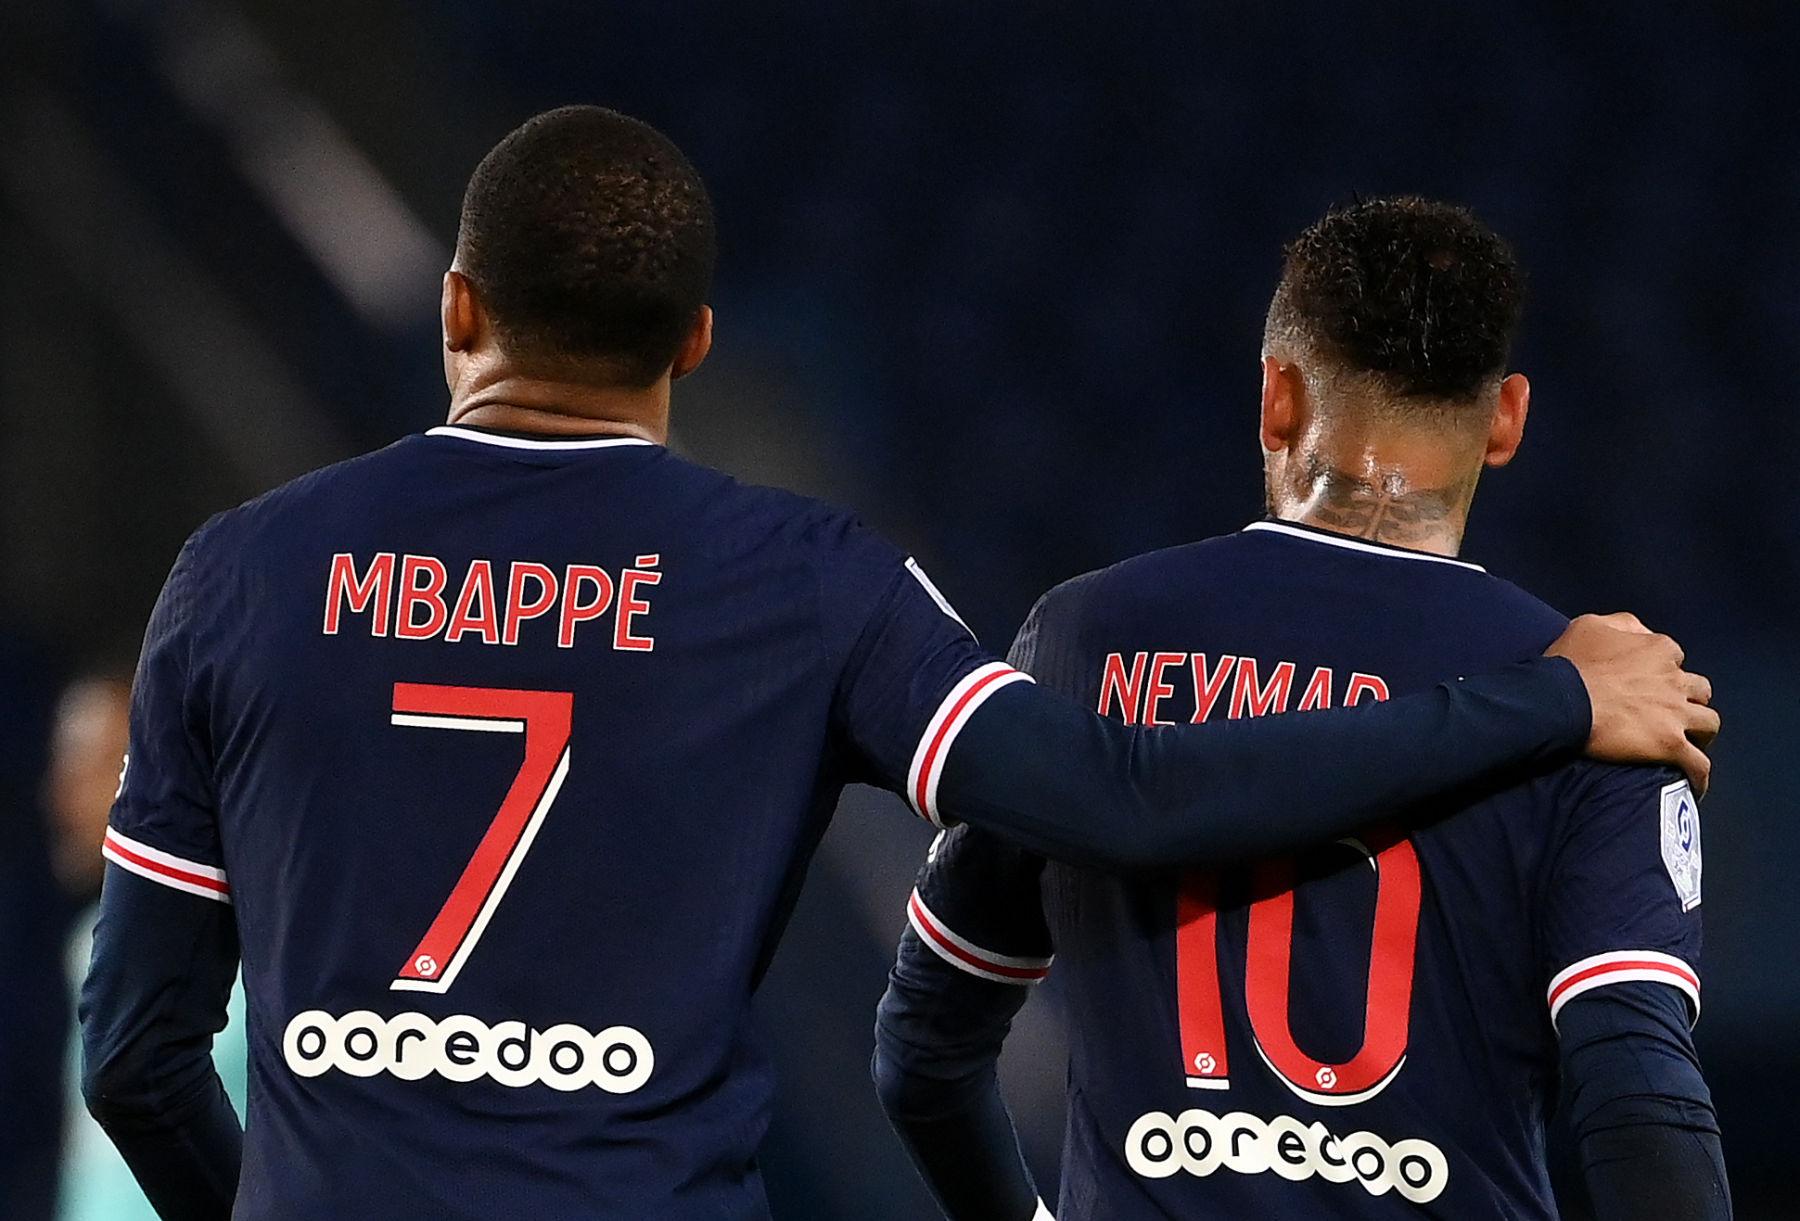 Kylian Mbappe และ Neymar